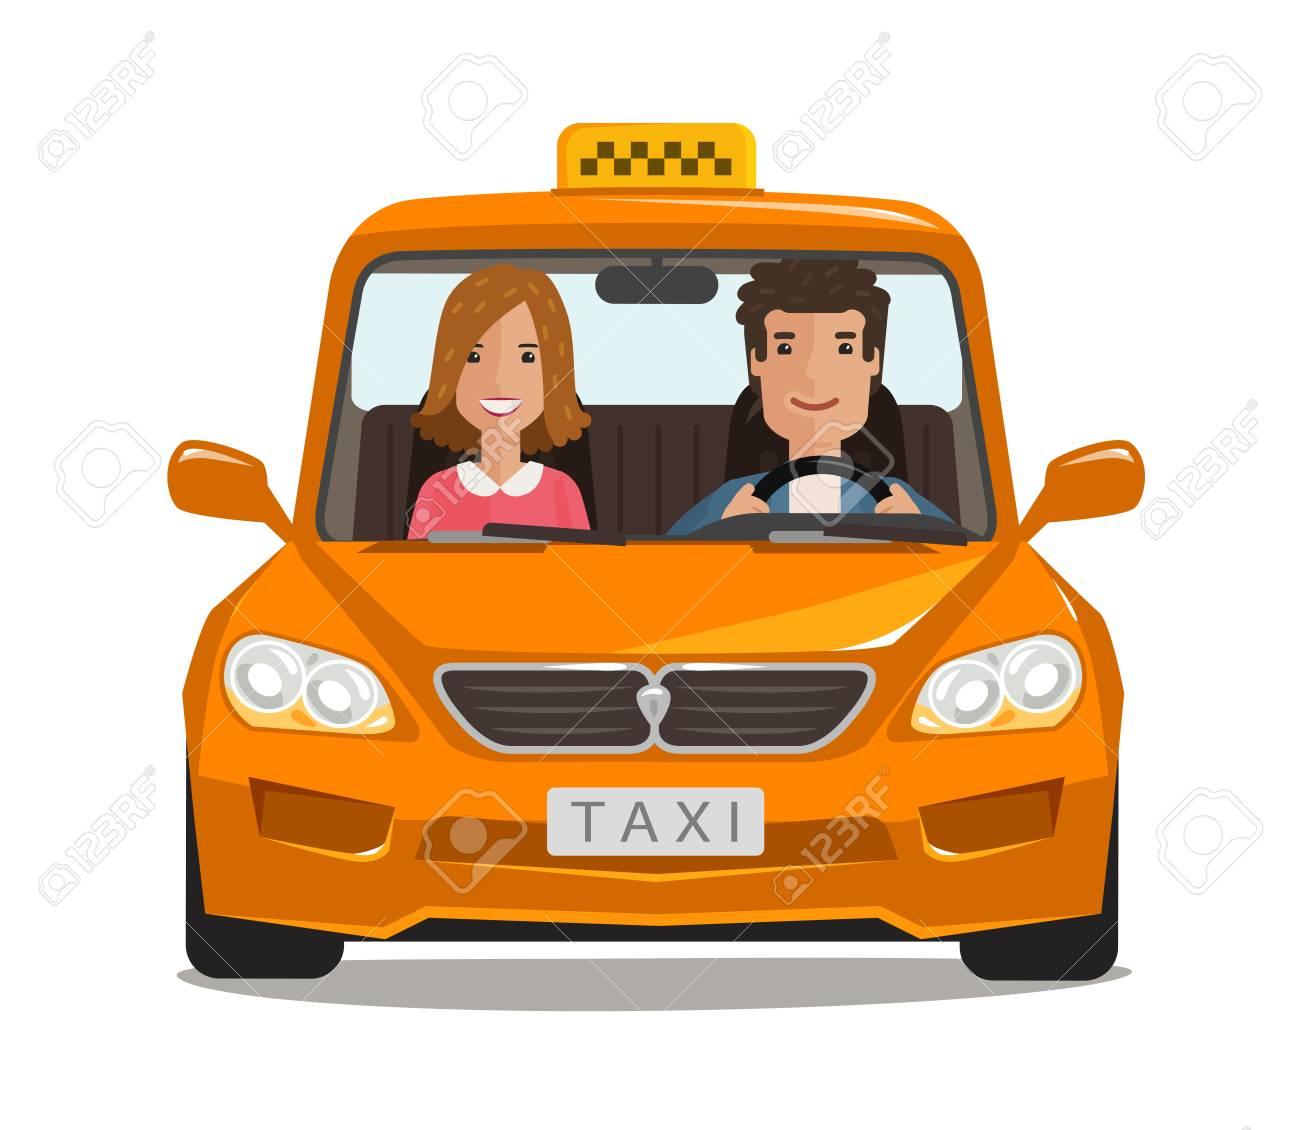 Taxi Cab Car Cartoon Transportation Concept Vector Illustration